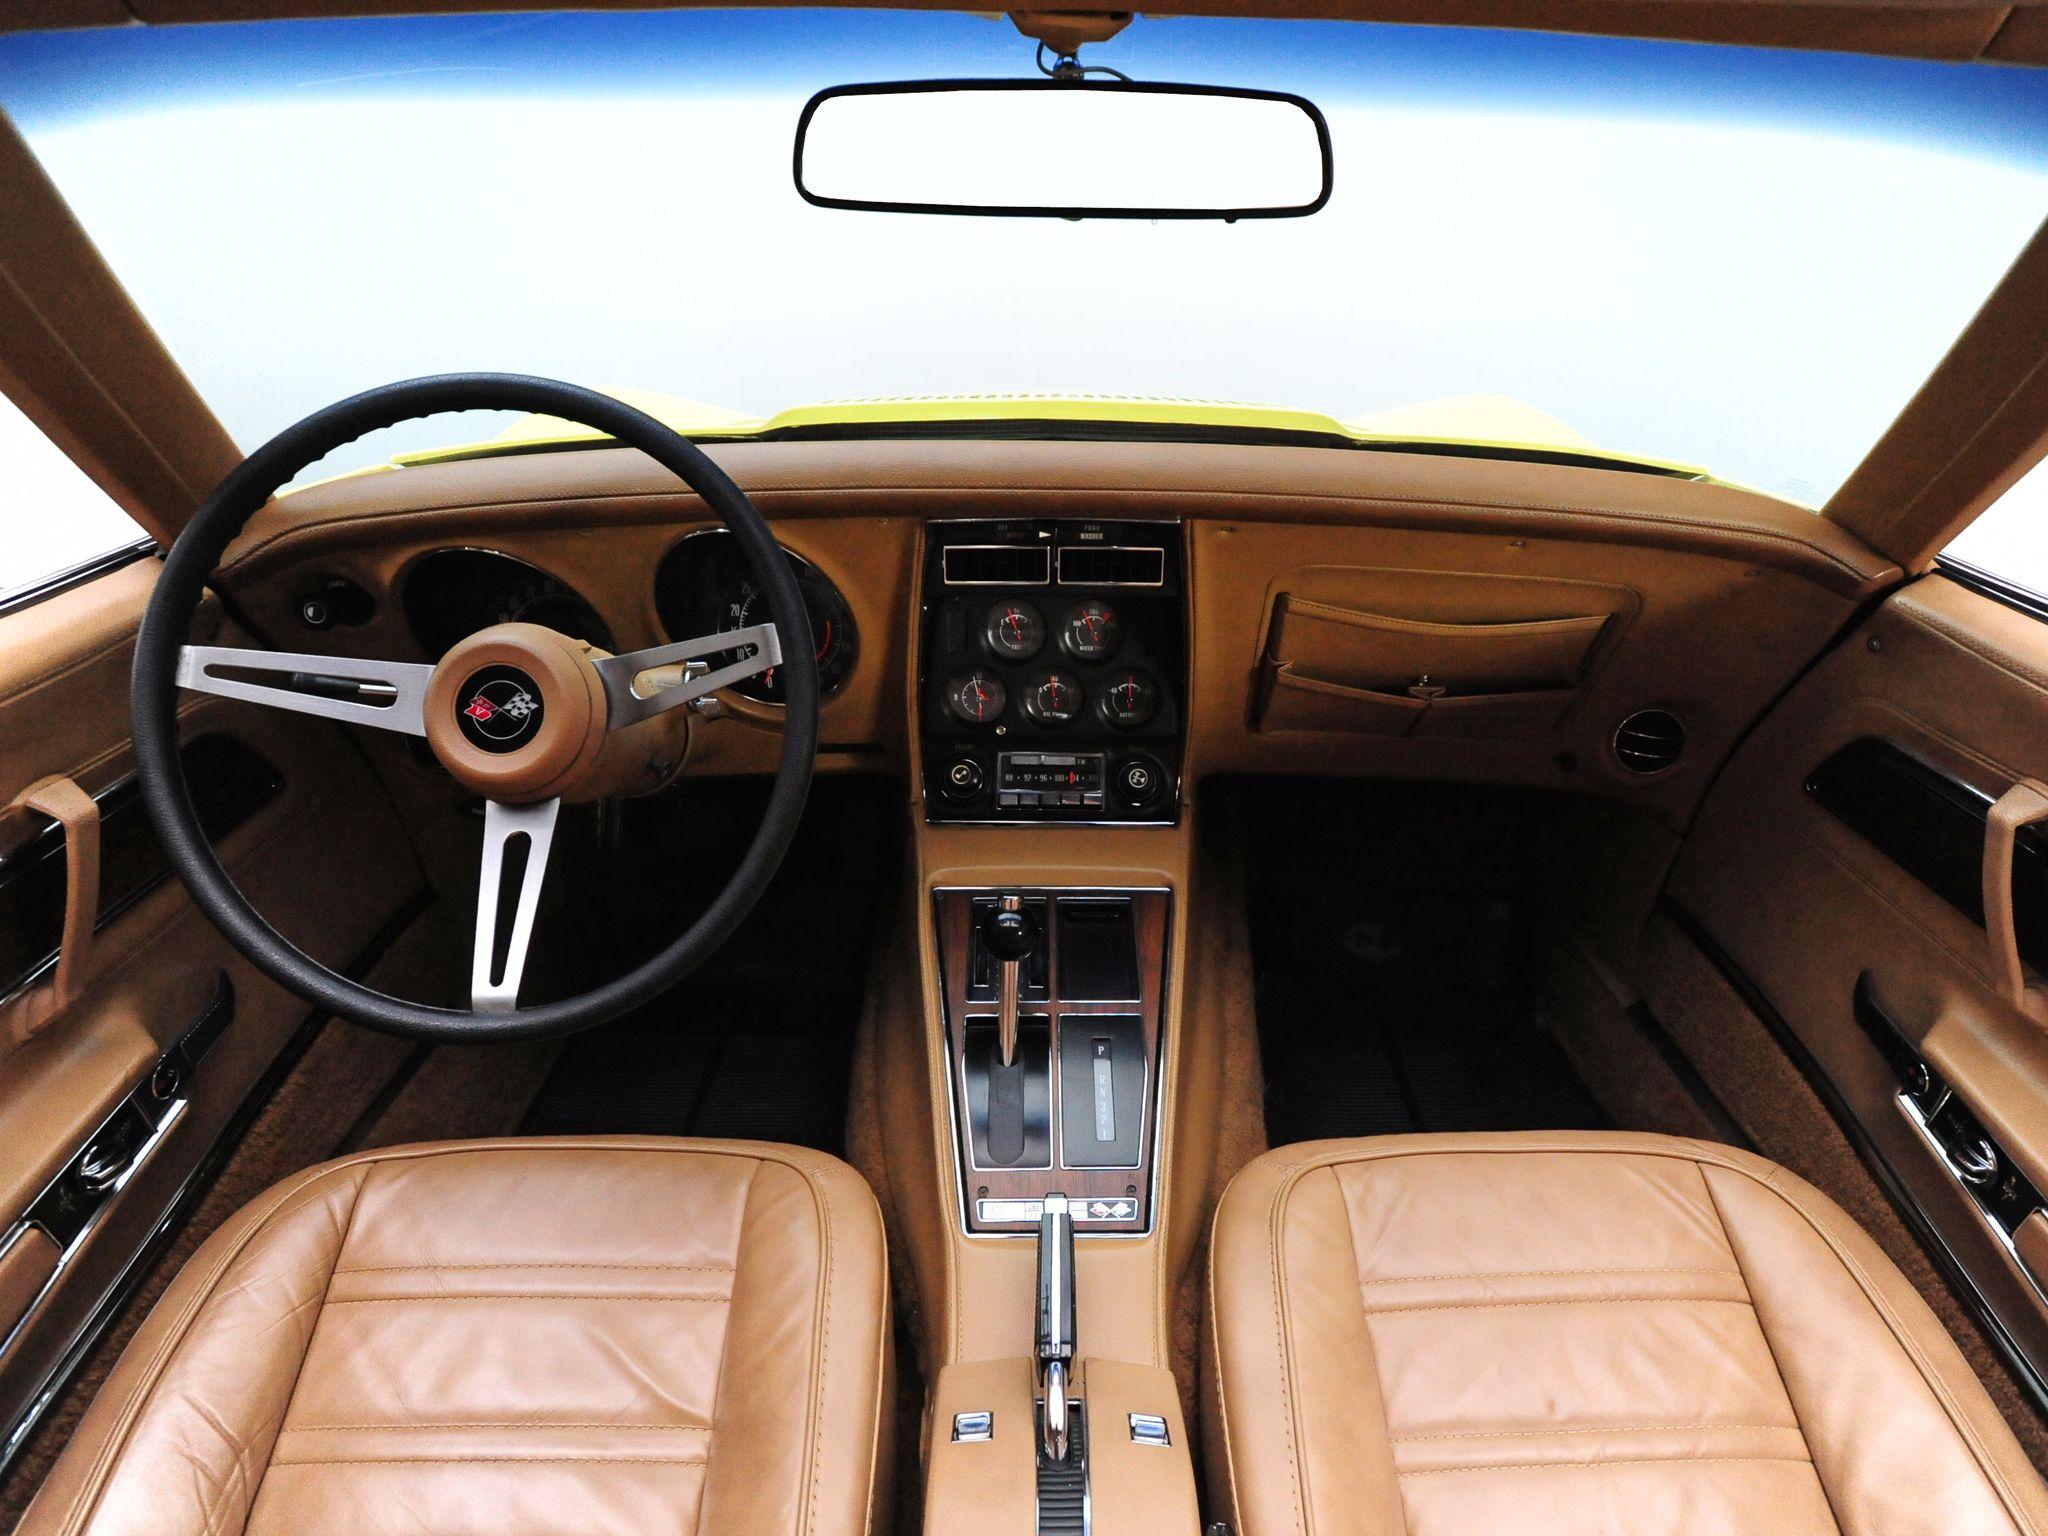 1974 chevrolet corvette stingray l82 interior and